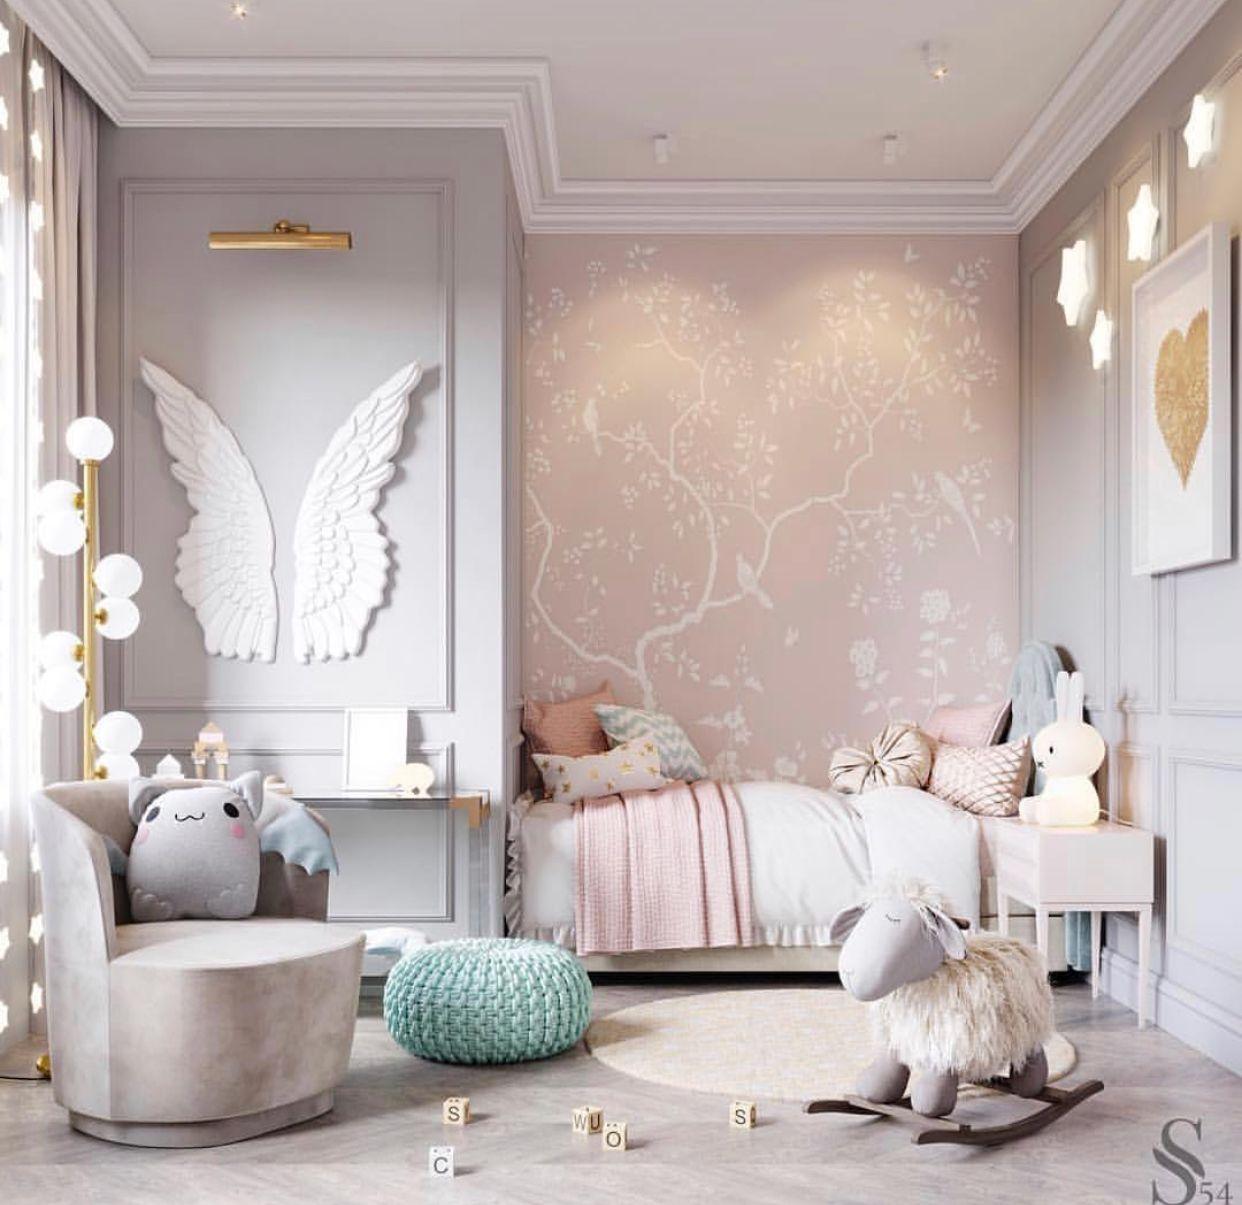 Studia 54 Girls bedroom Wallpaper | INTERIOR in 2019 | Girl ...